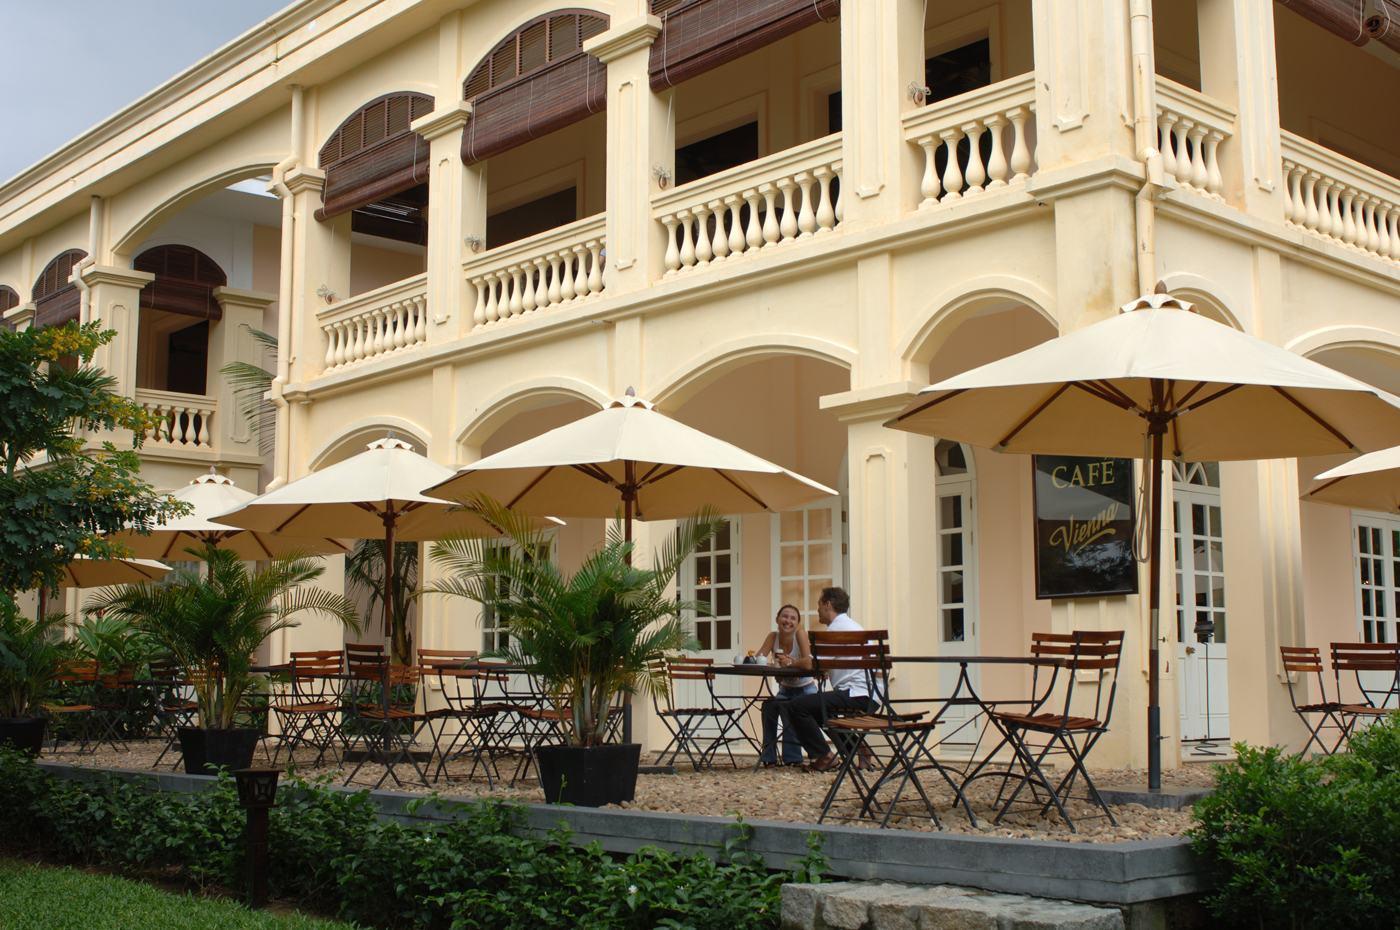 Vietnam-Anantara-Hoi-An-Life-Resort-Viena-cafe-alfresco